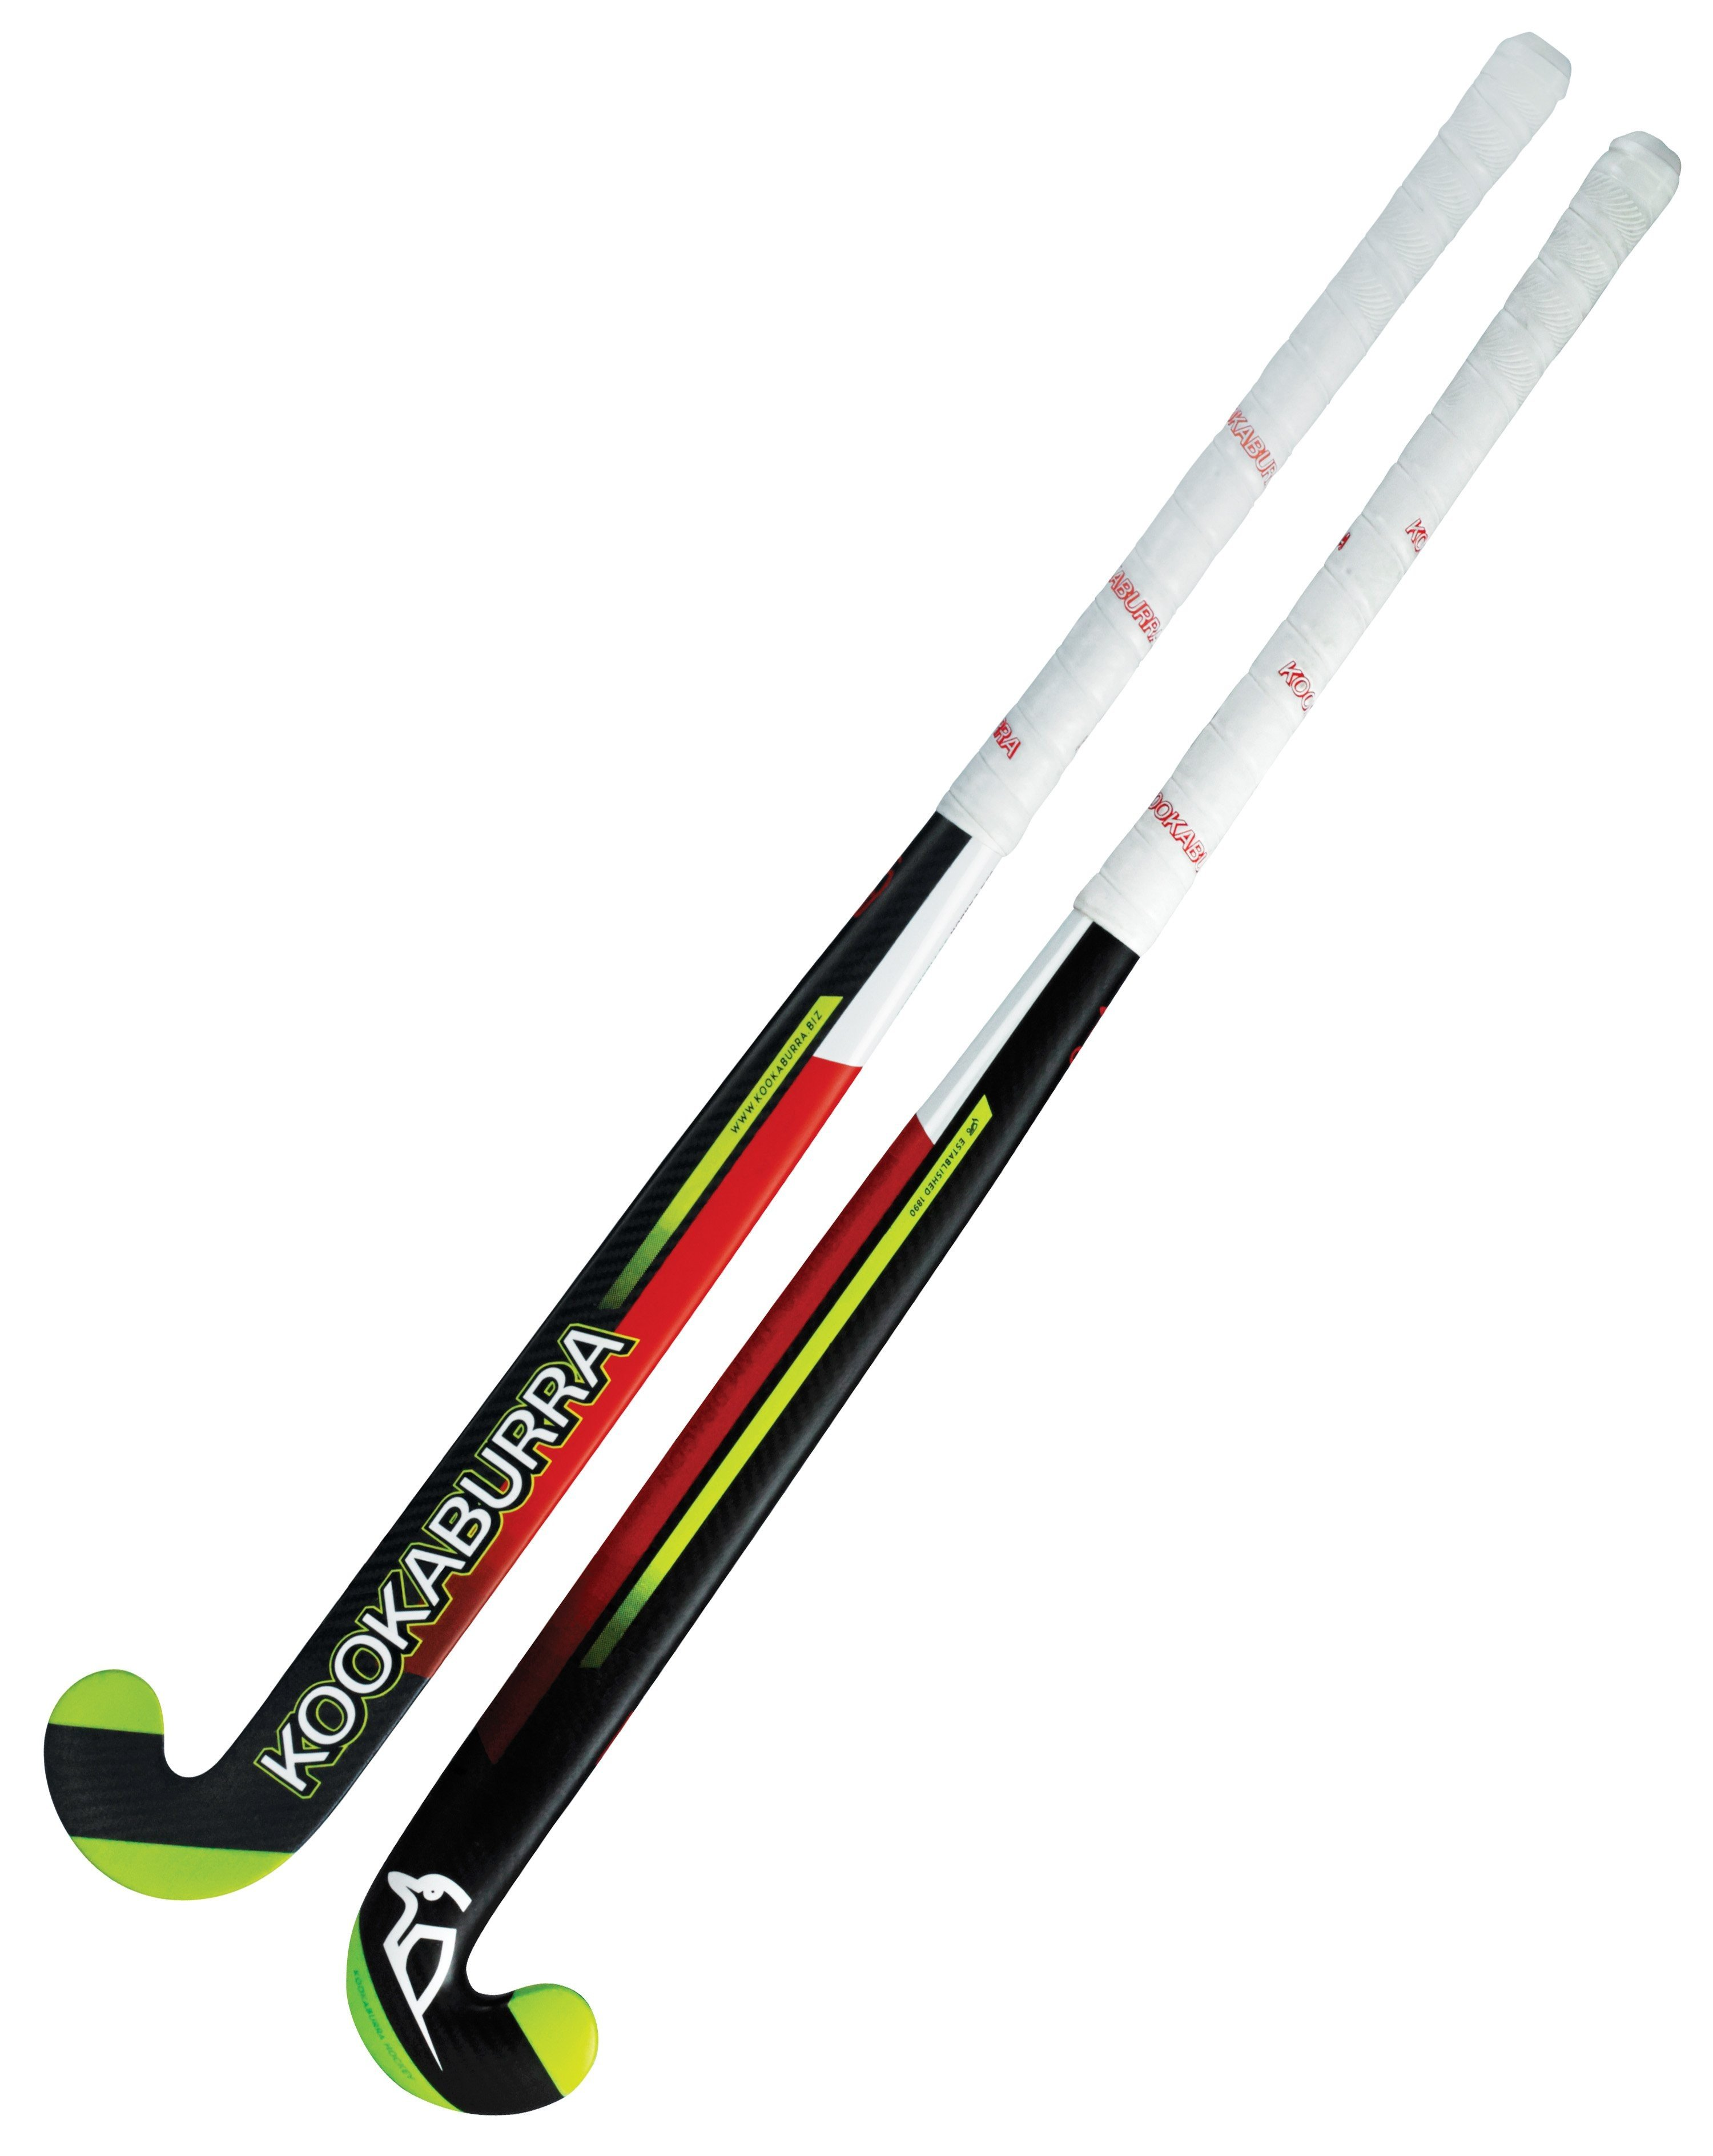 2016/17 Kookaburra Team Dragon Mbow Hockey Stick